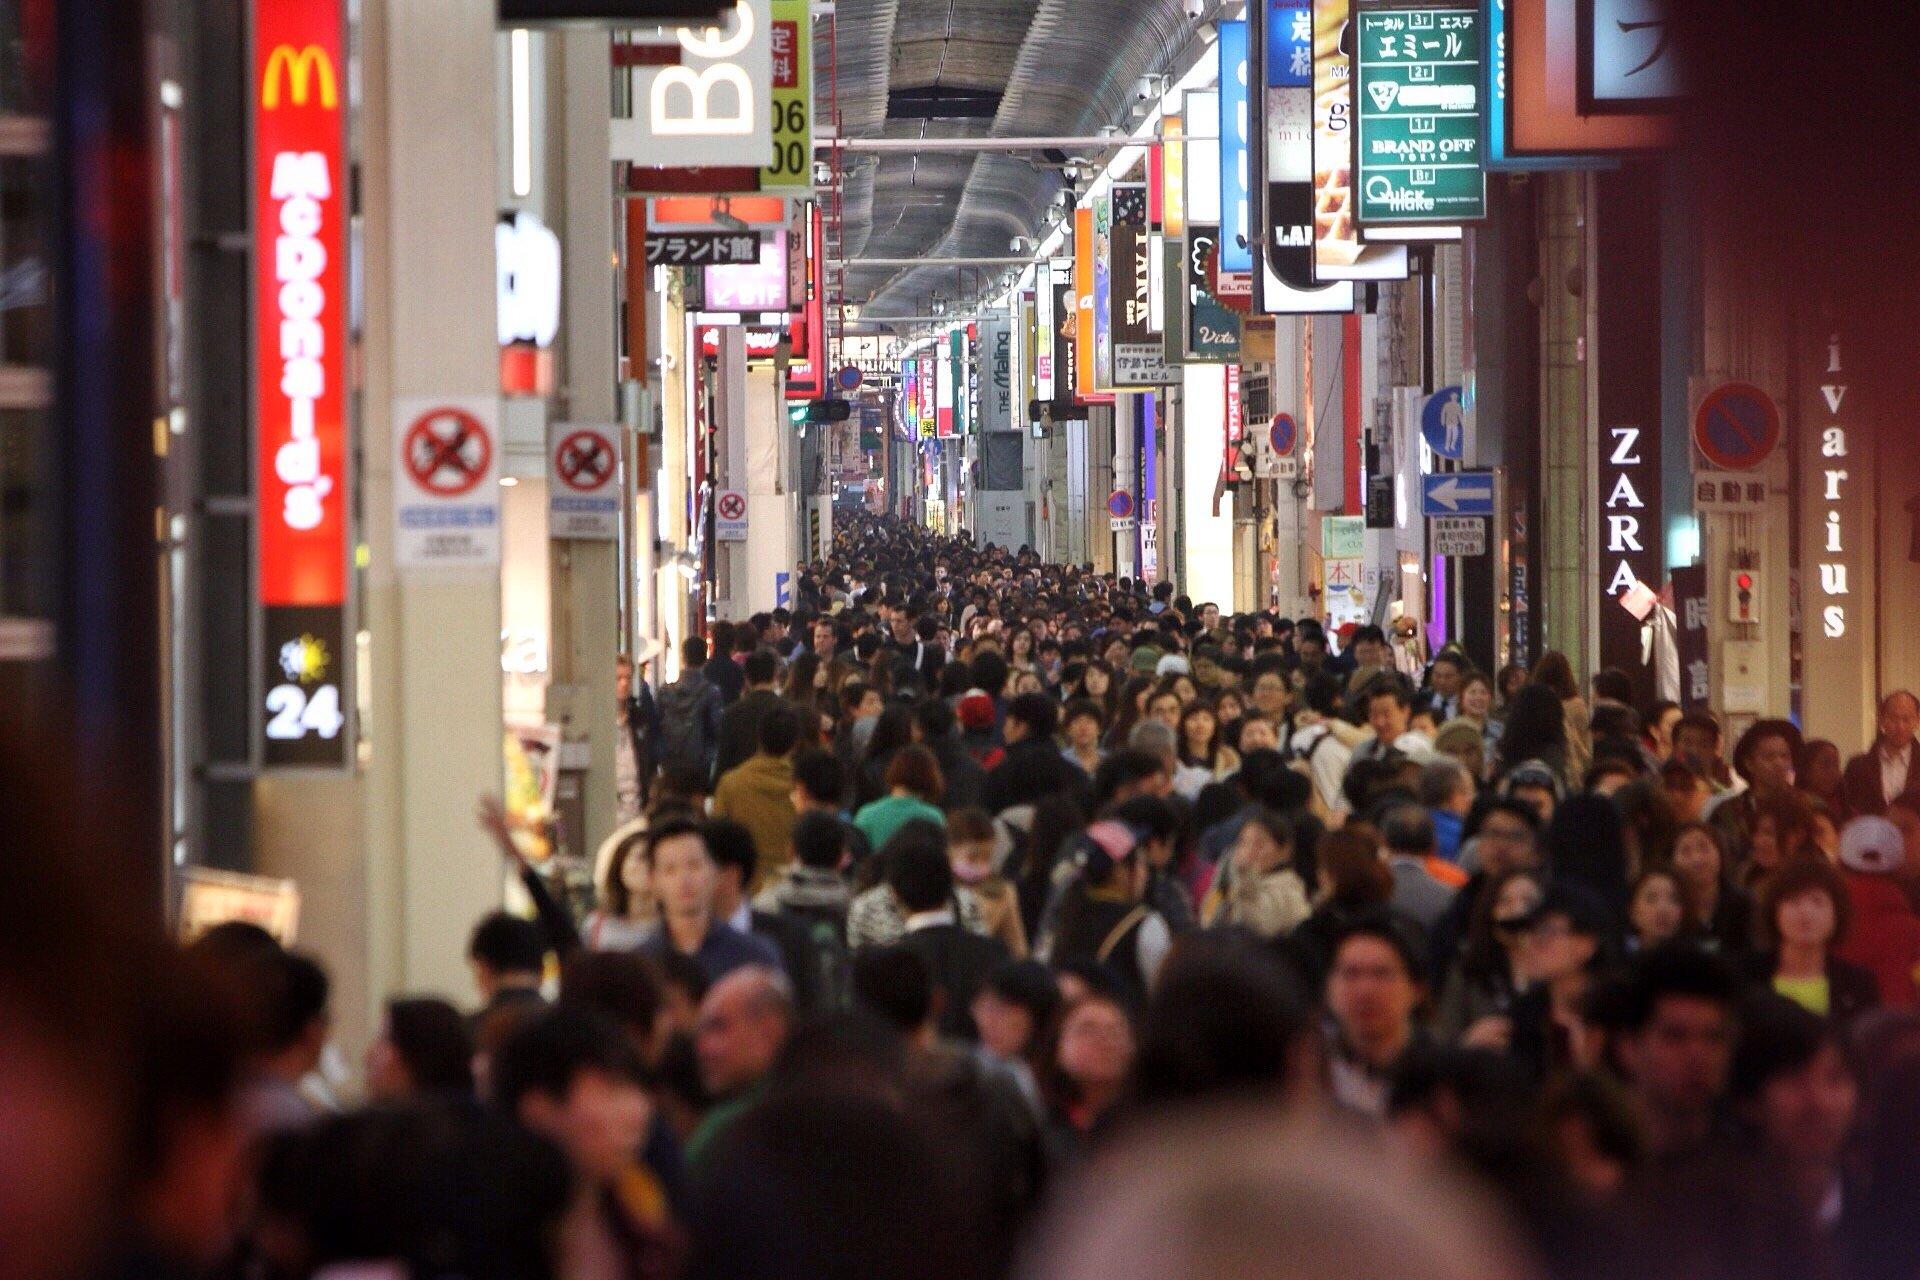 shinsaibashi-osaka-crowded-tourist-foto-blog-kasuma